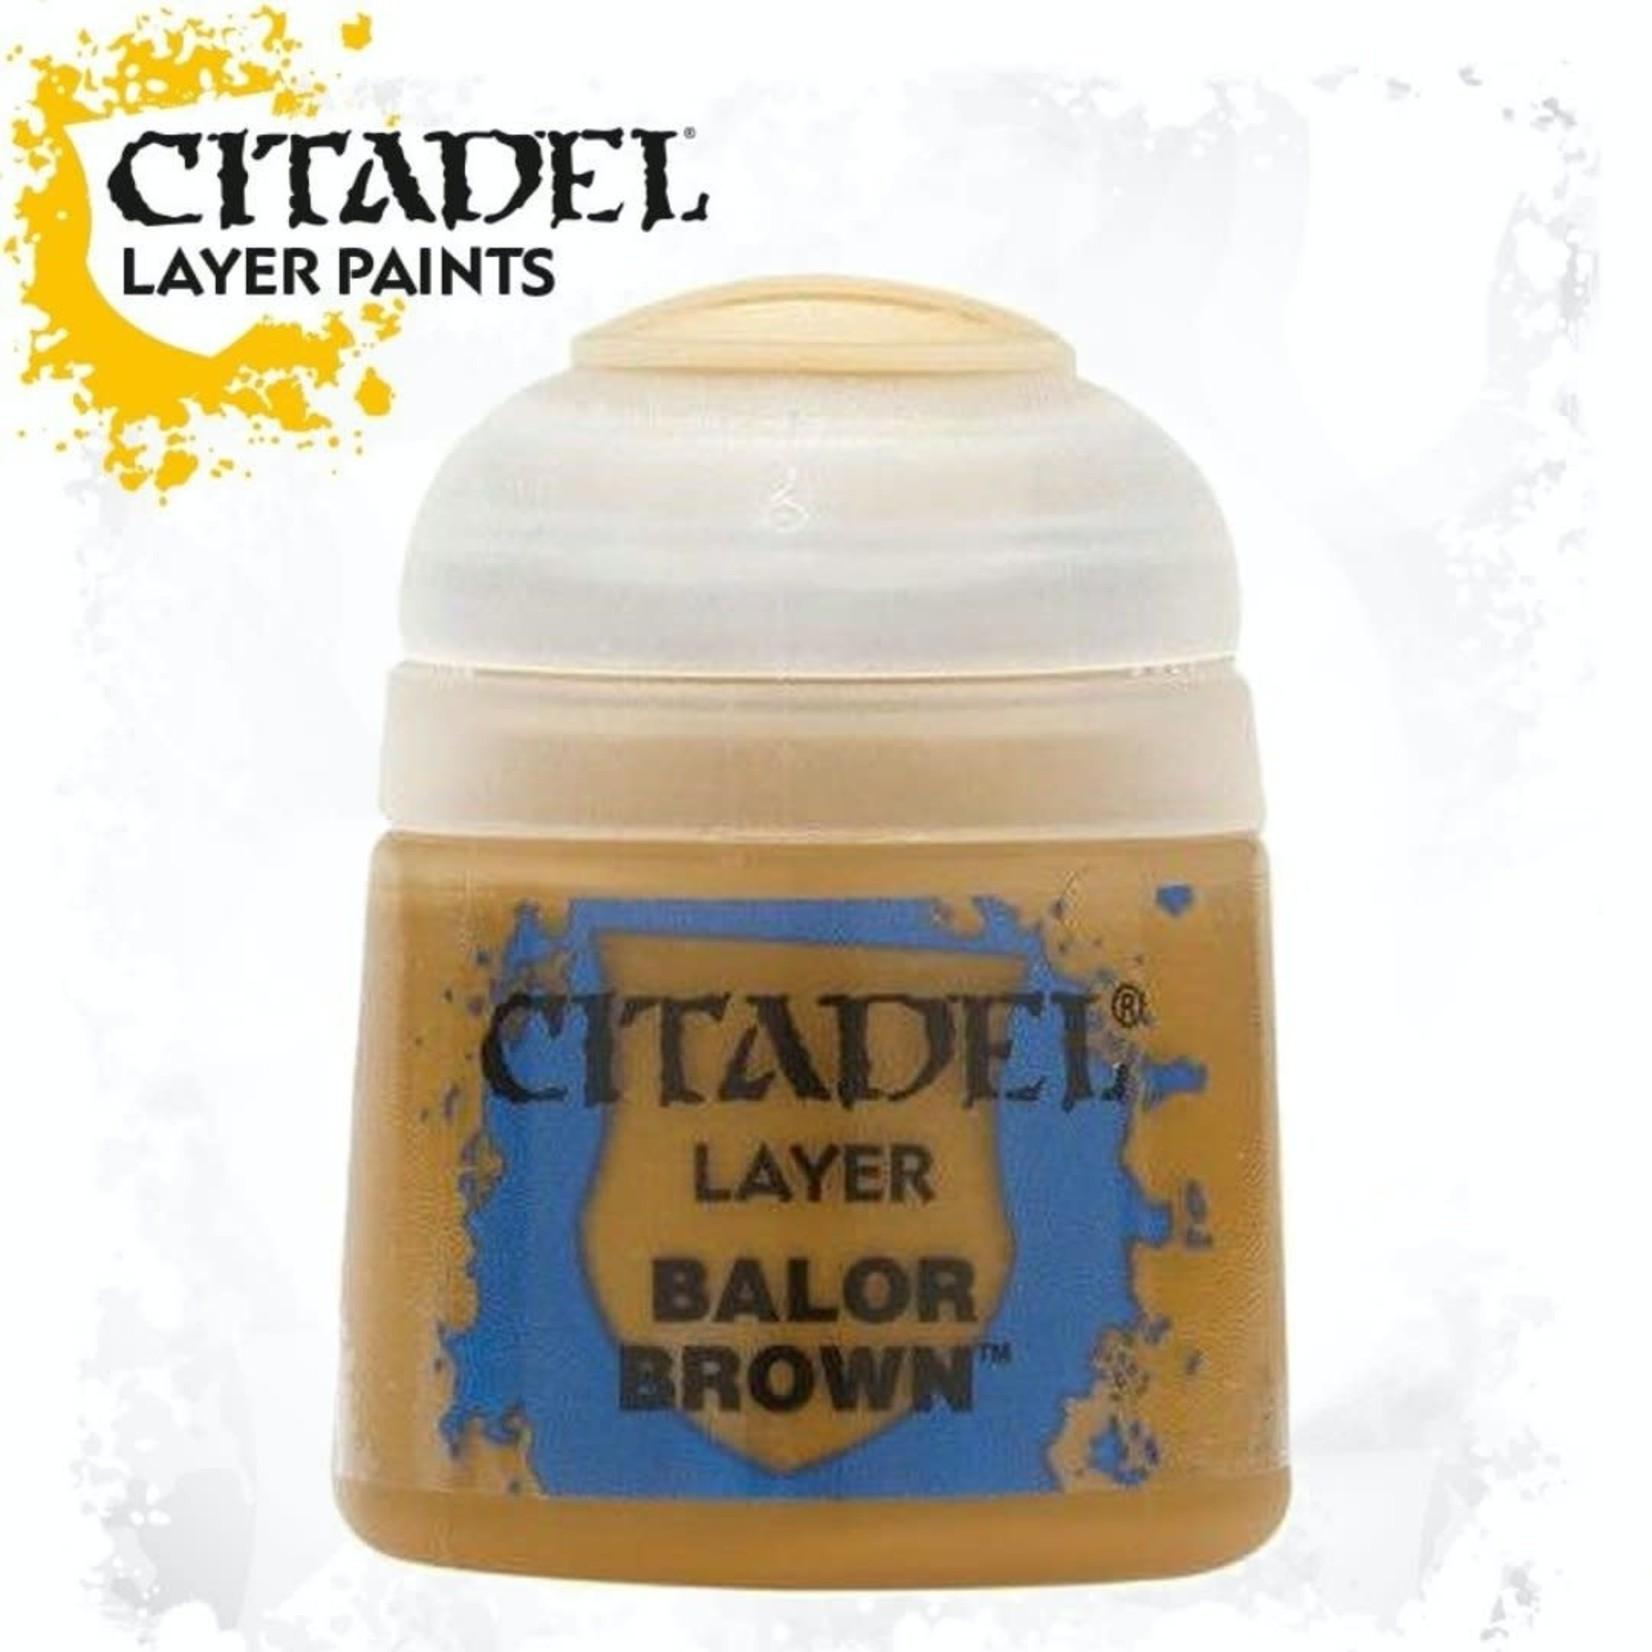 Citadel Citadel Paint - Layer: Balor Brown